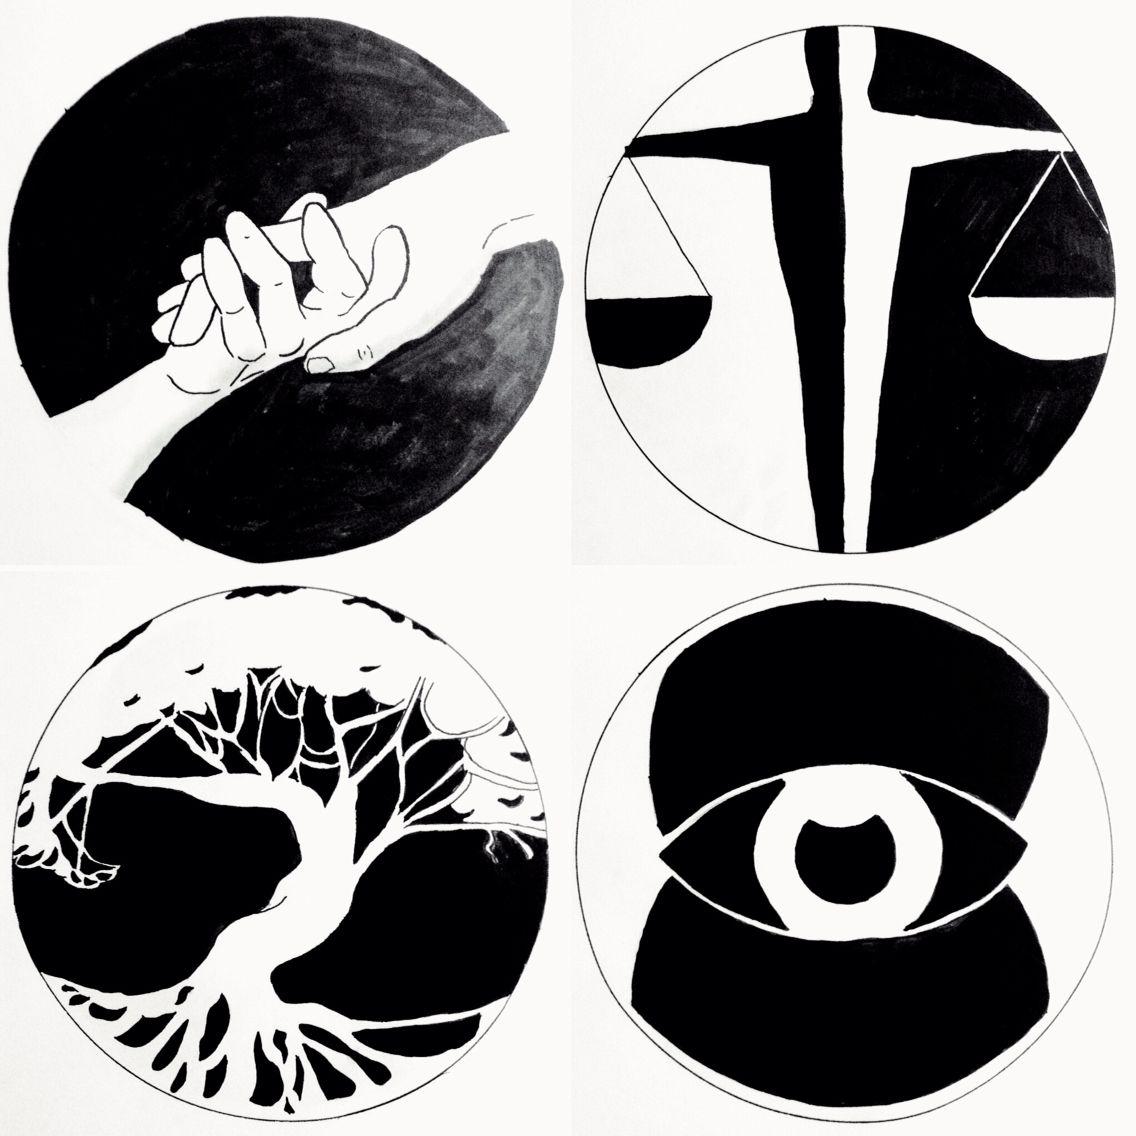 Divergent art by Ruby Ostrander | Cool drawings, Art, Artwork